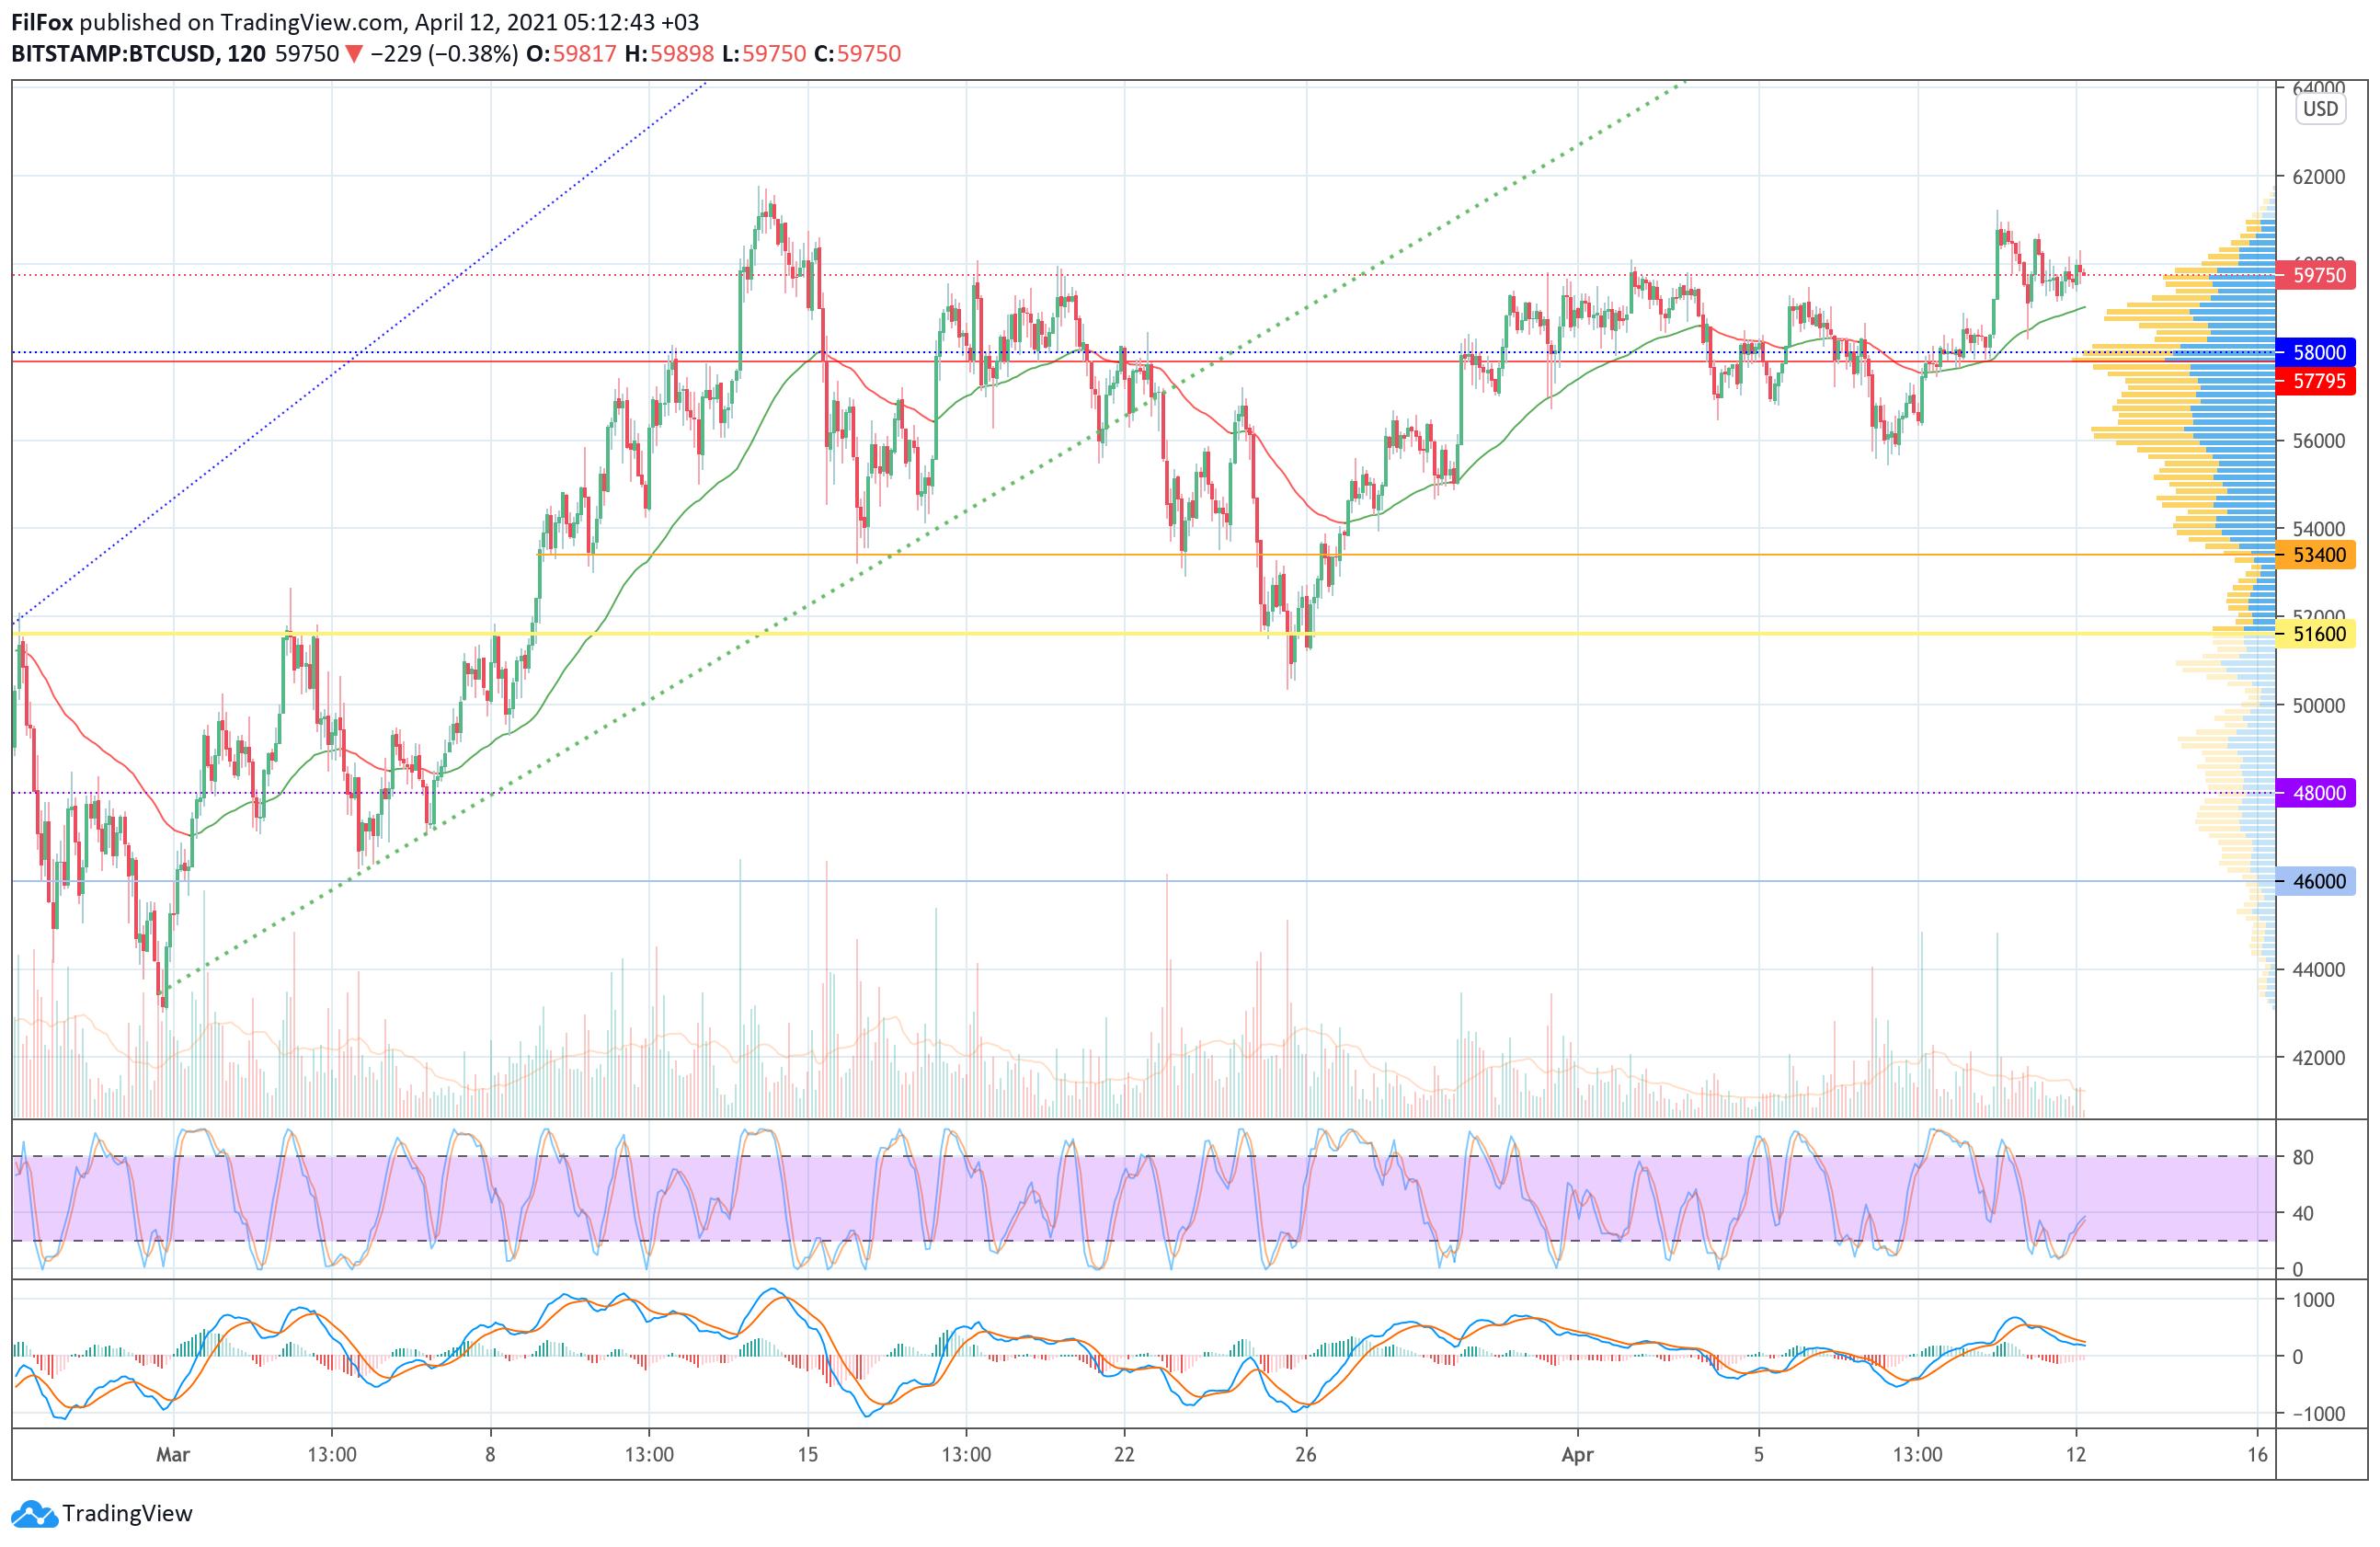 Анализ цен Bitcoin, Ethereum, XRP на 12.04.2021